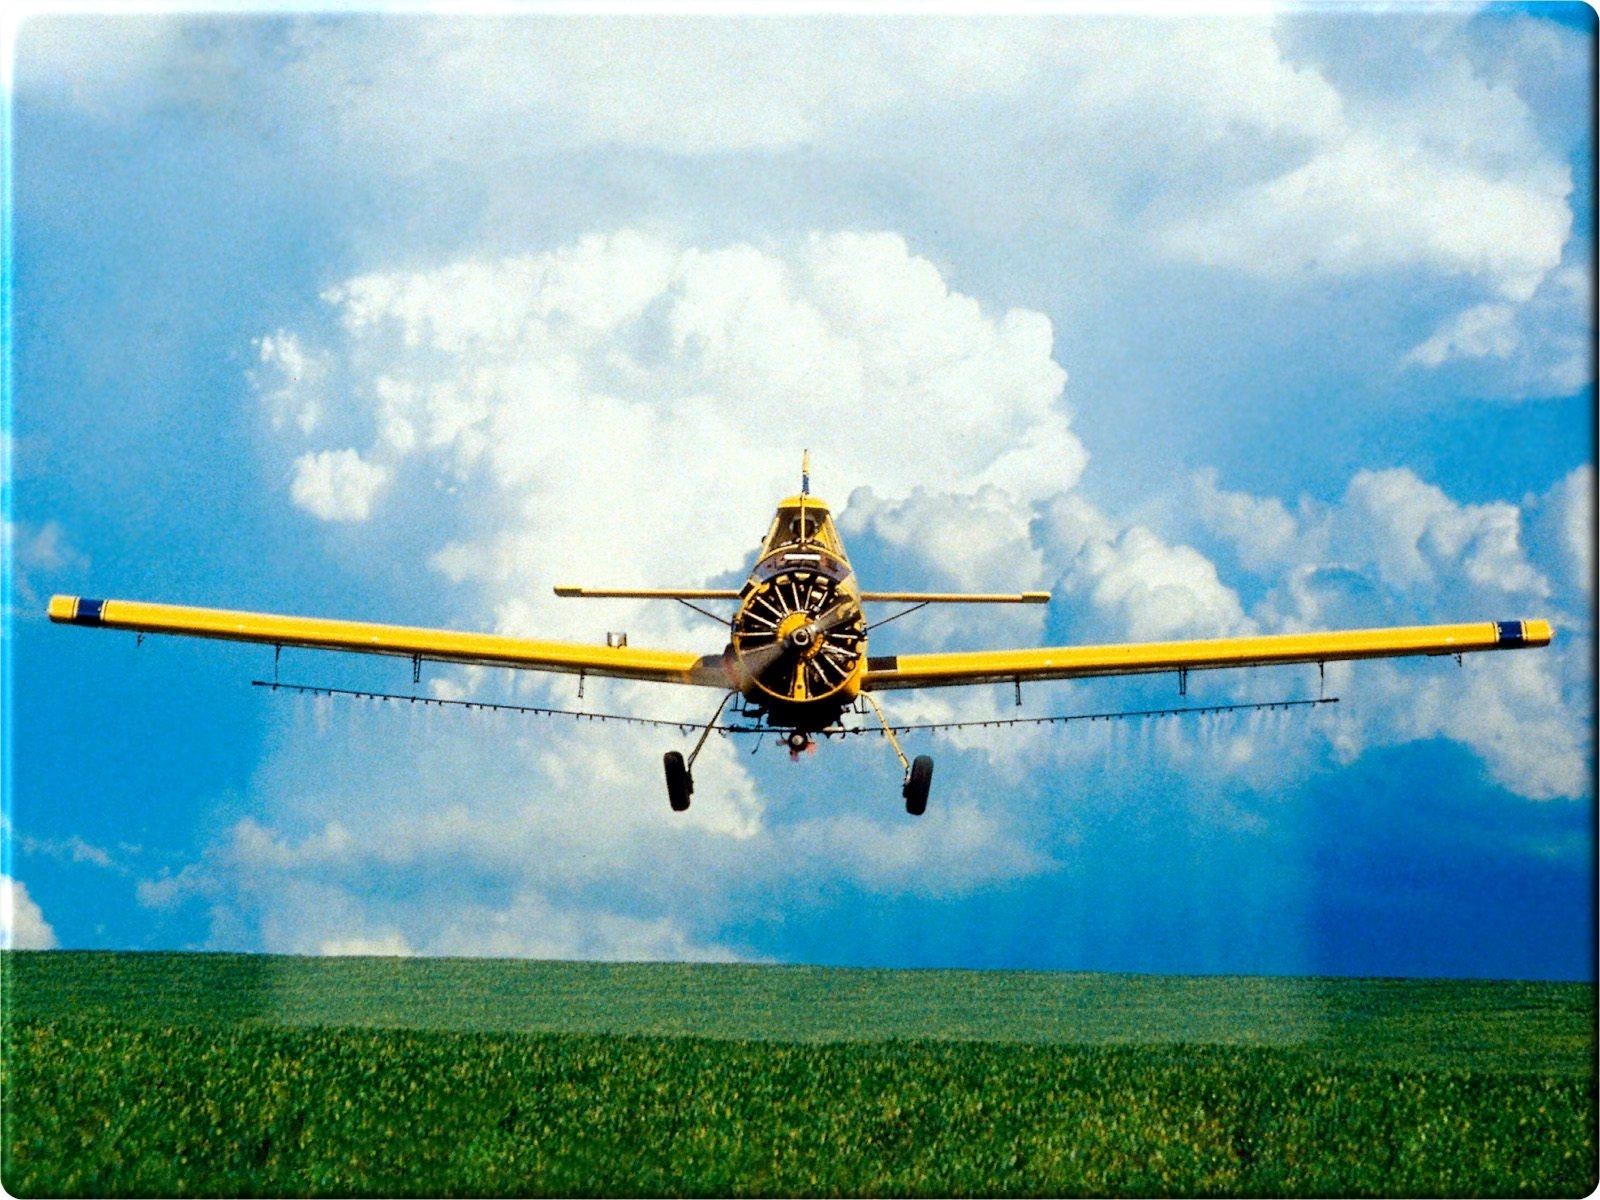 aeroplane wallpapers in hdaeroplane - photo #15